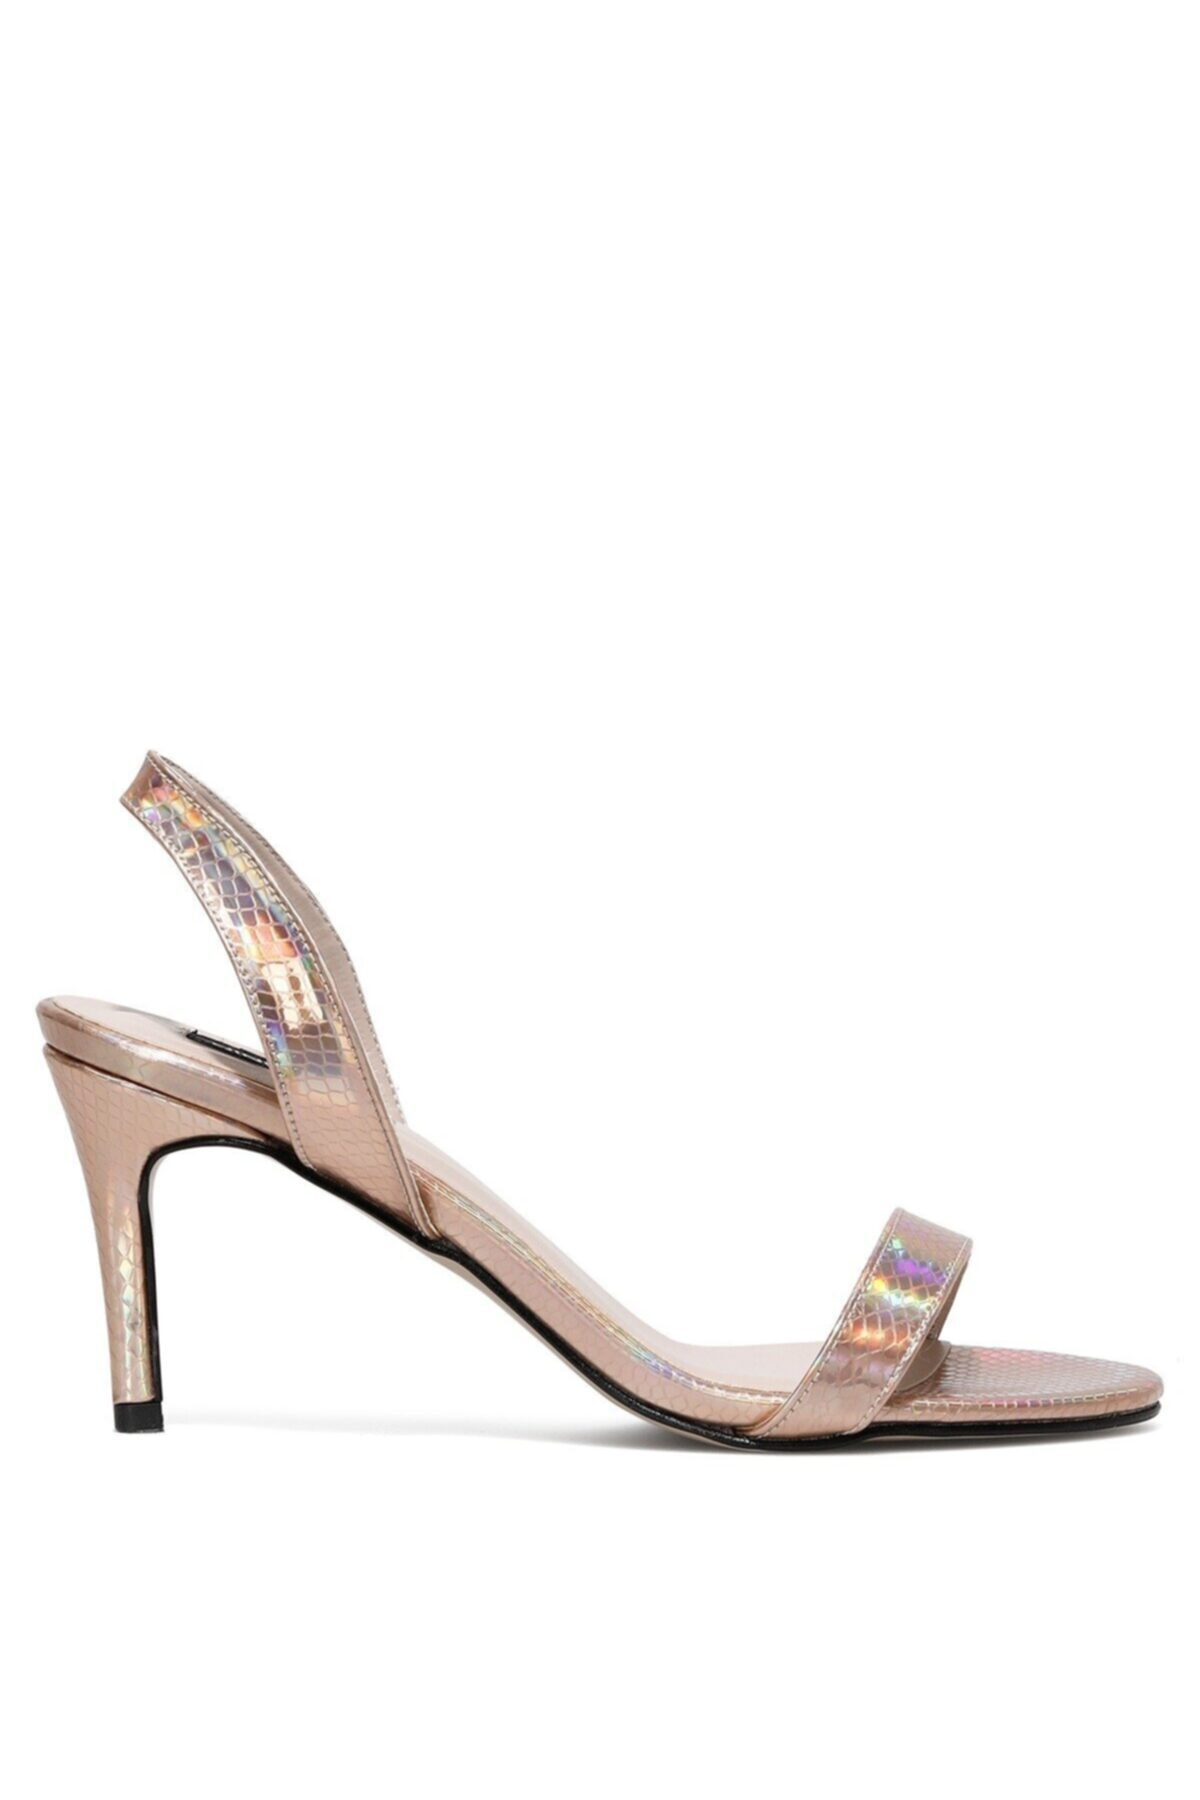 Punamı2 1fx Rose Gold Kadın Topuklu Ayakkabı